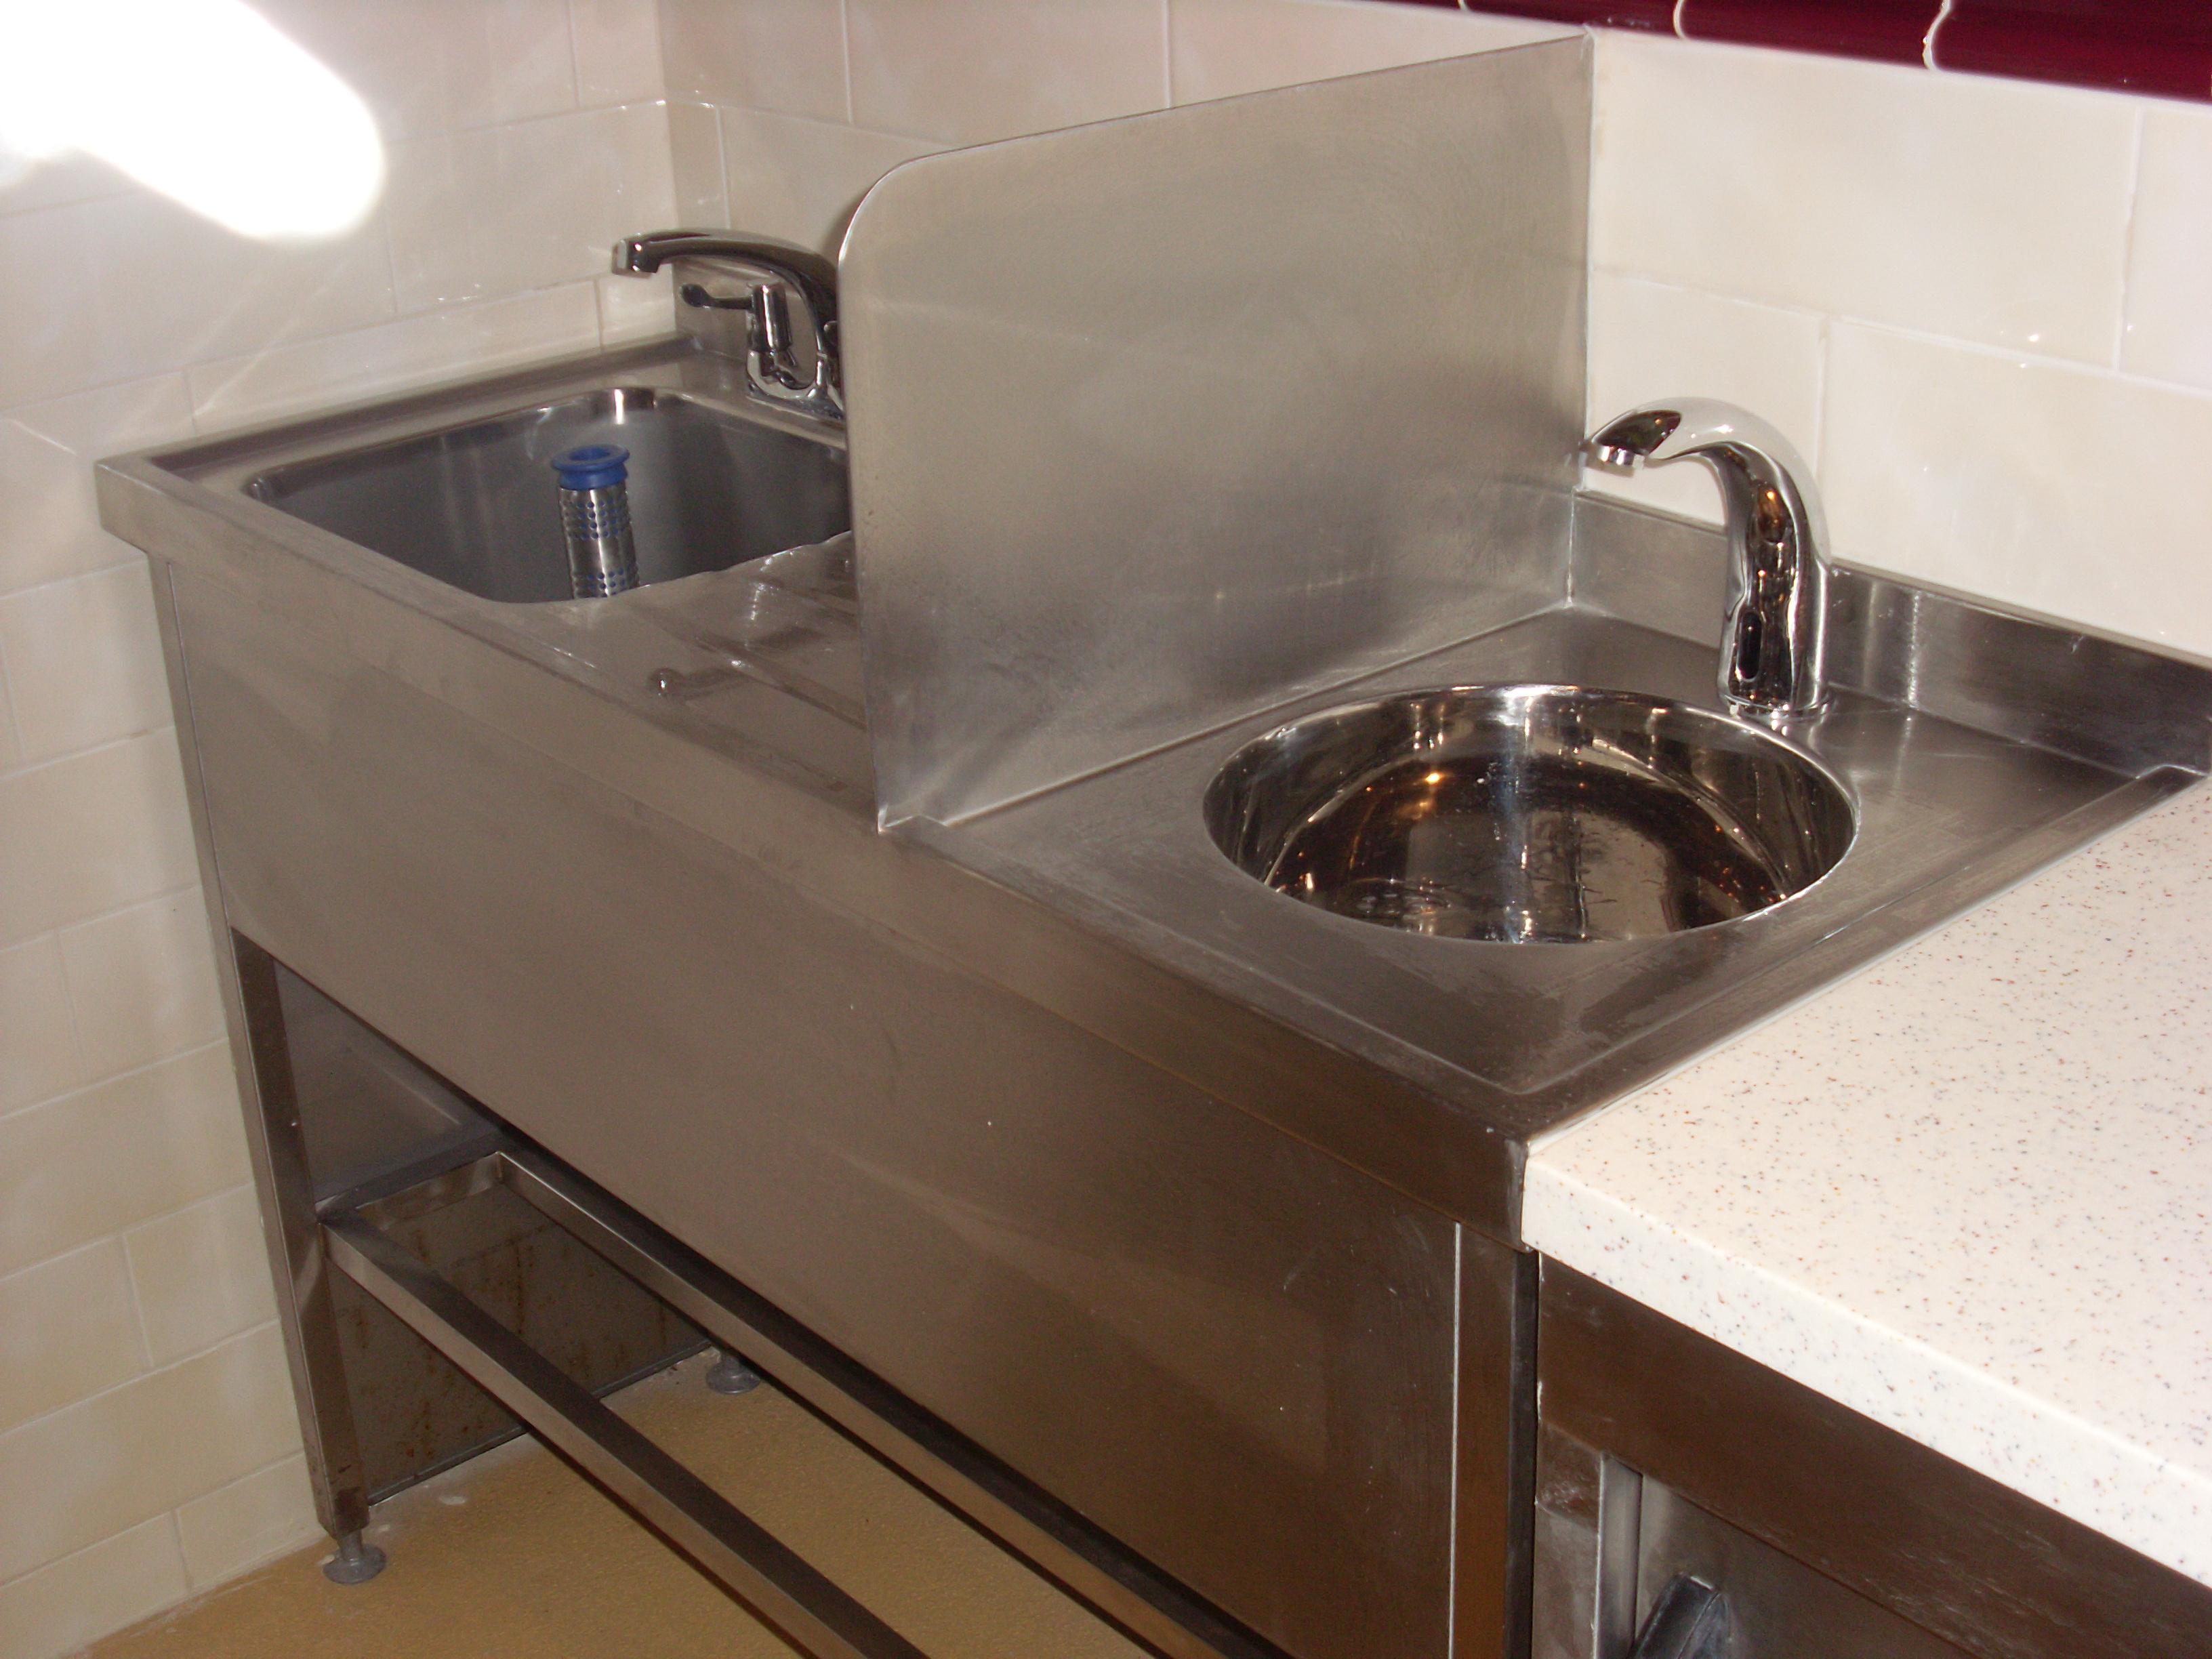 Jkss Sheffield Stainless Steel Commercial Catering Sinks Uk